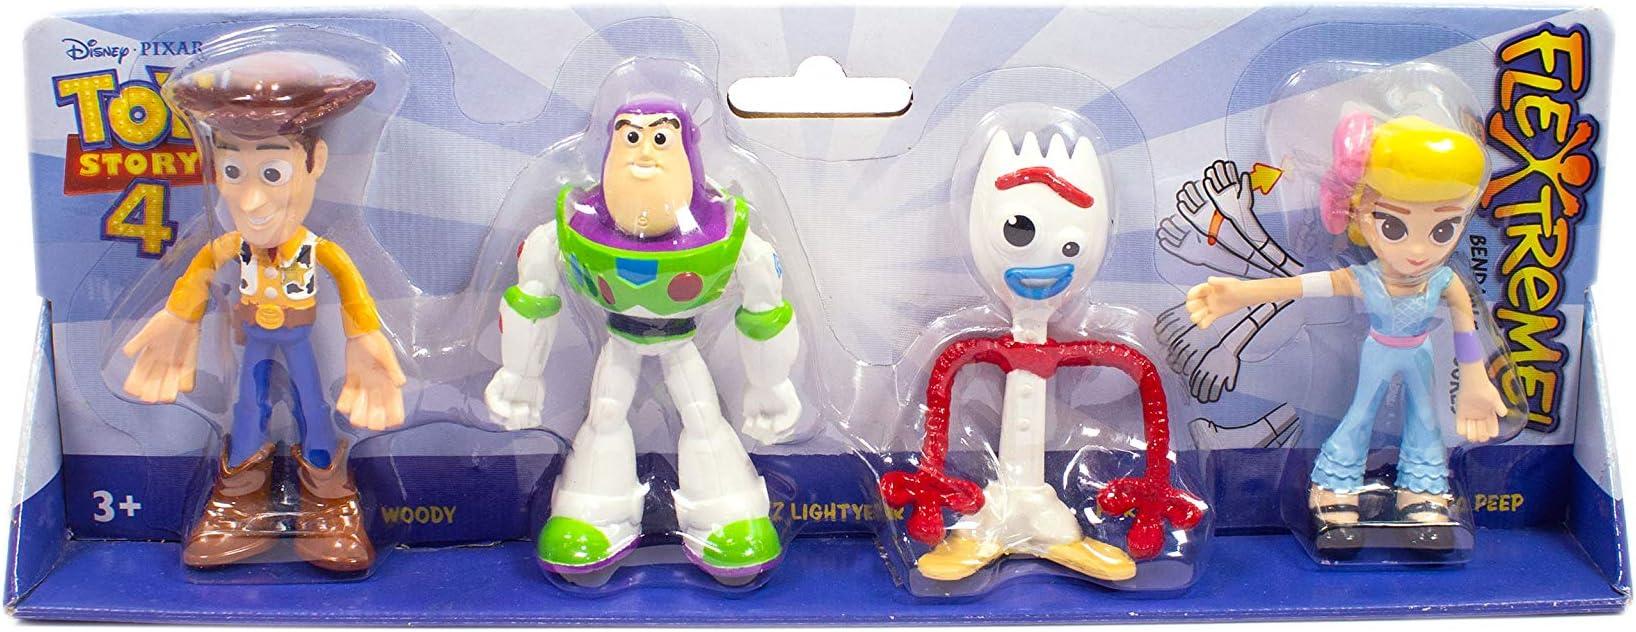 "Toy Story 4 Disney Pixar BO PEEP 3/"" New figurine collectible cake topper"